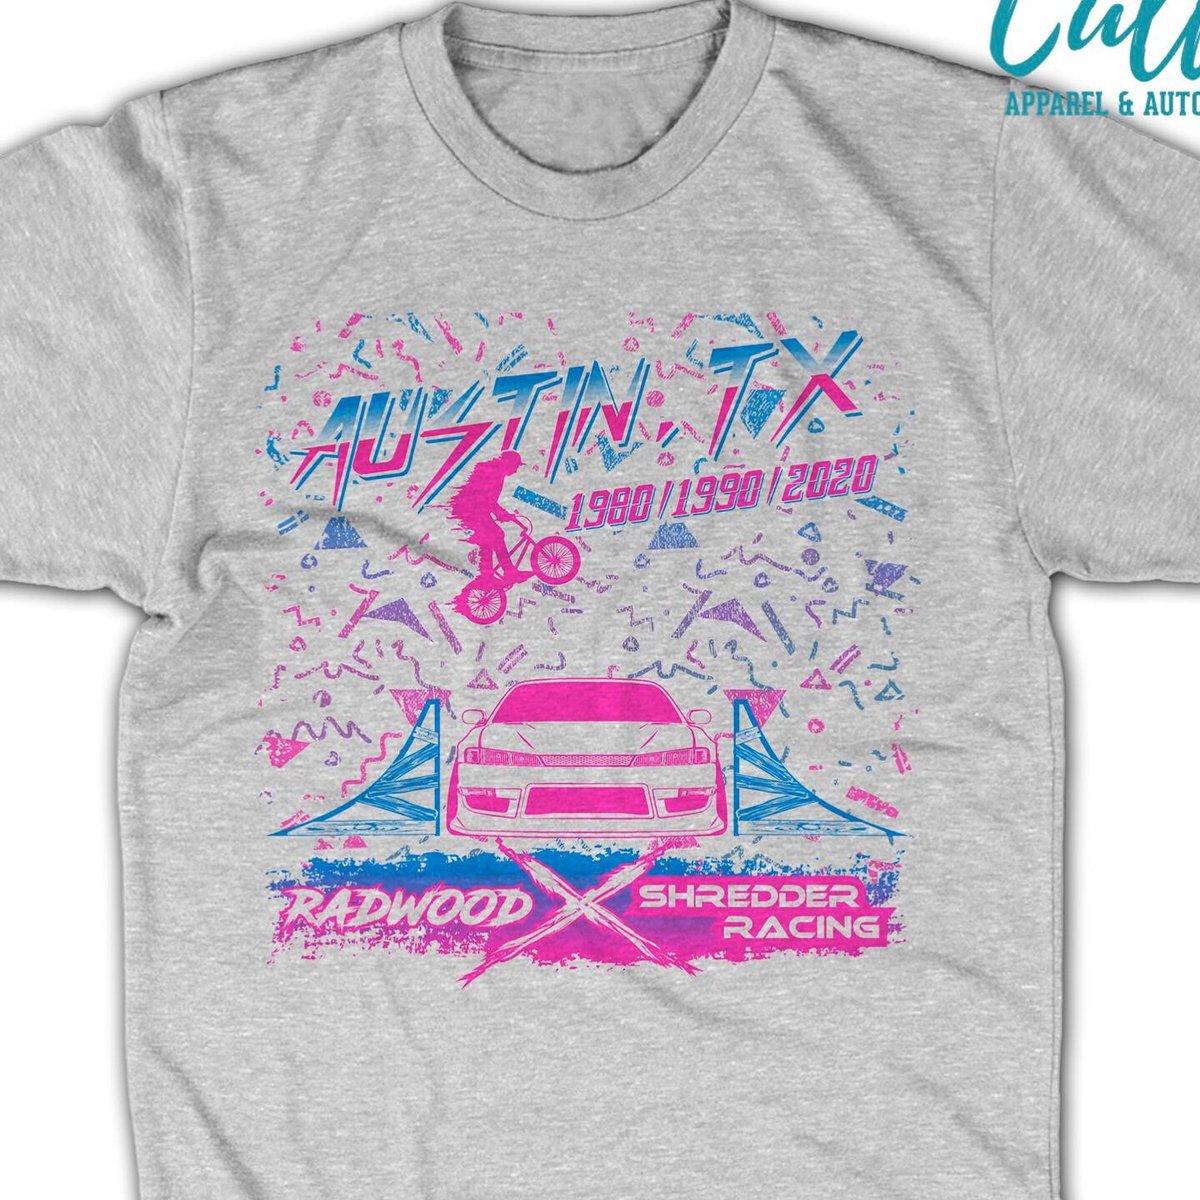 Image of RADWOOD X Shredder Racing shirt